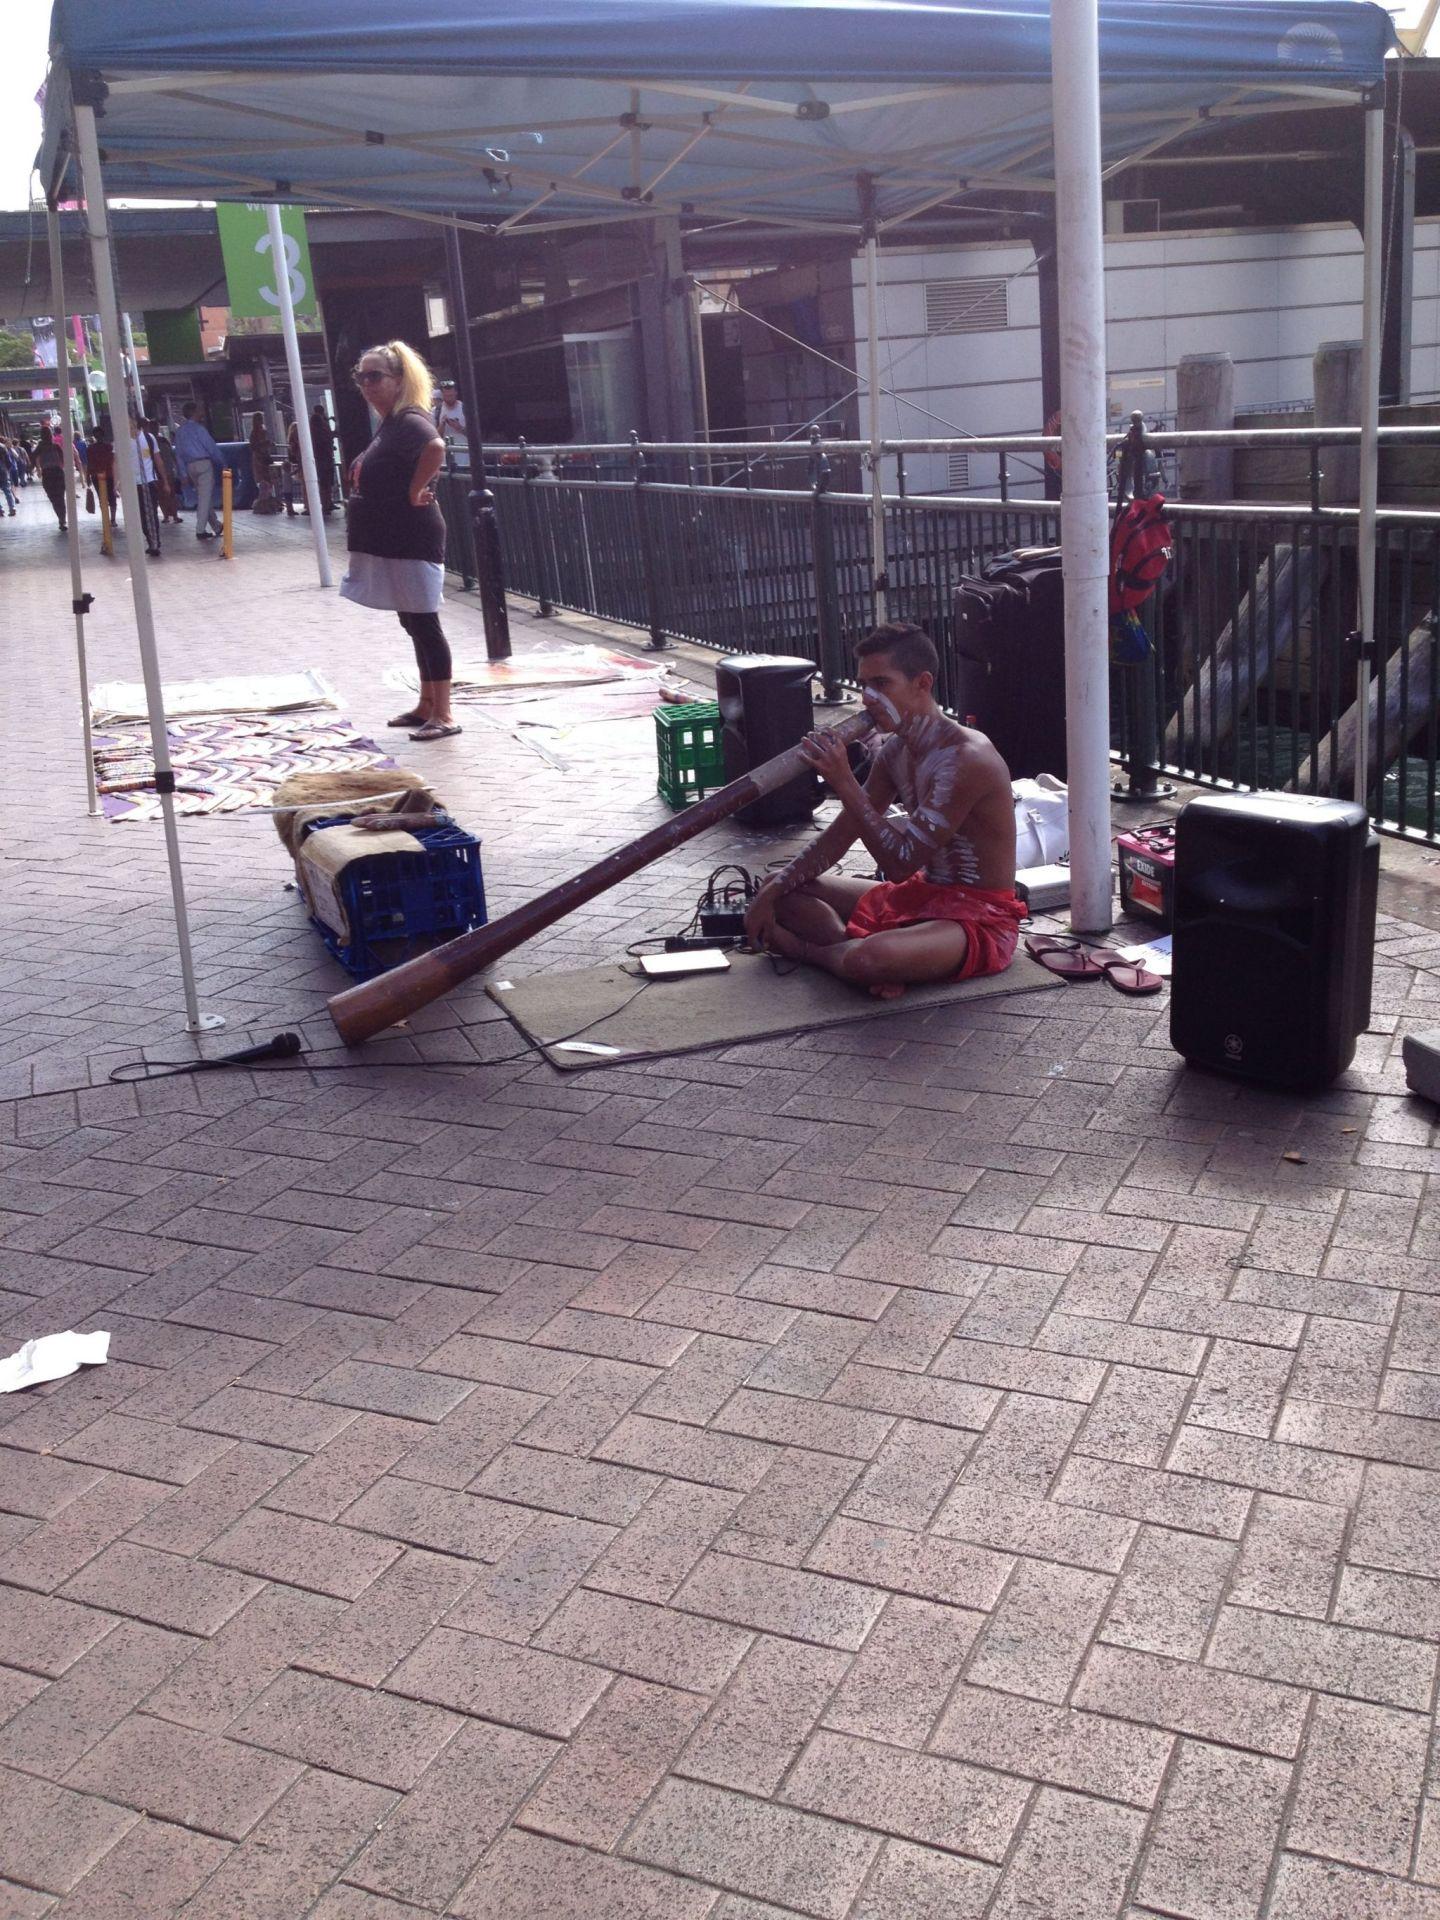 Didgeridoo player at Circular Quay, Sydney